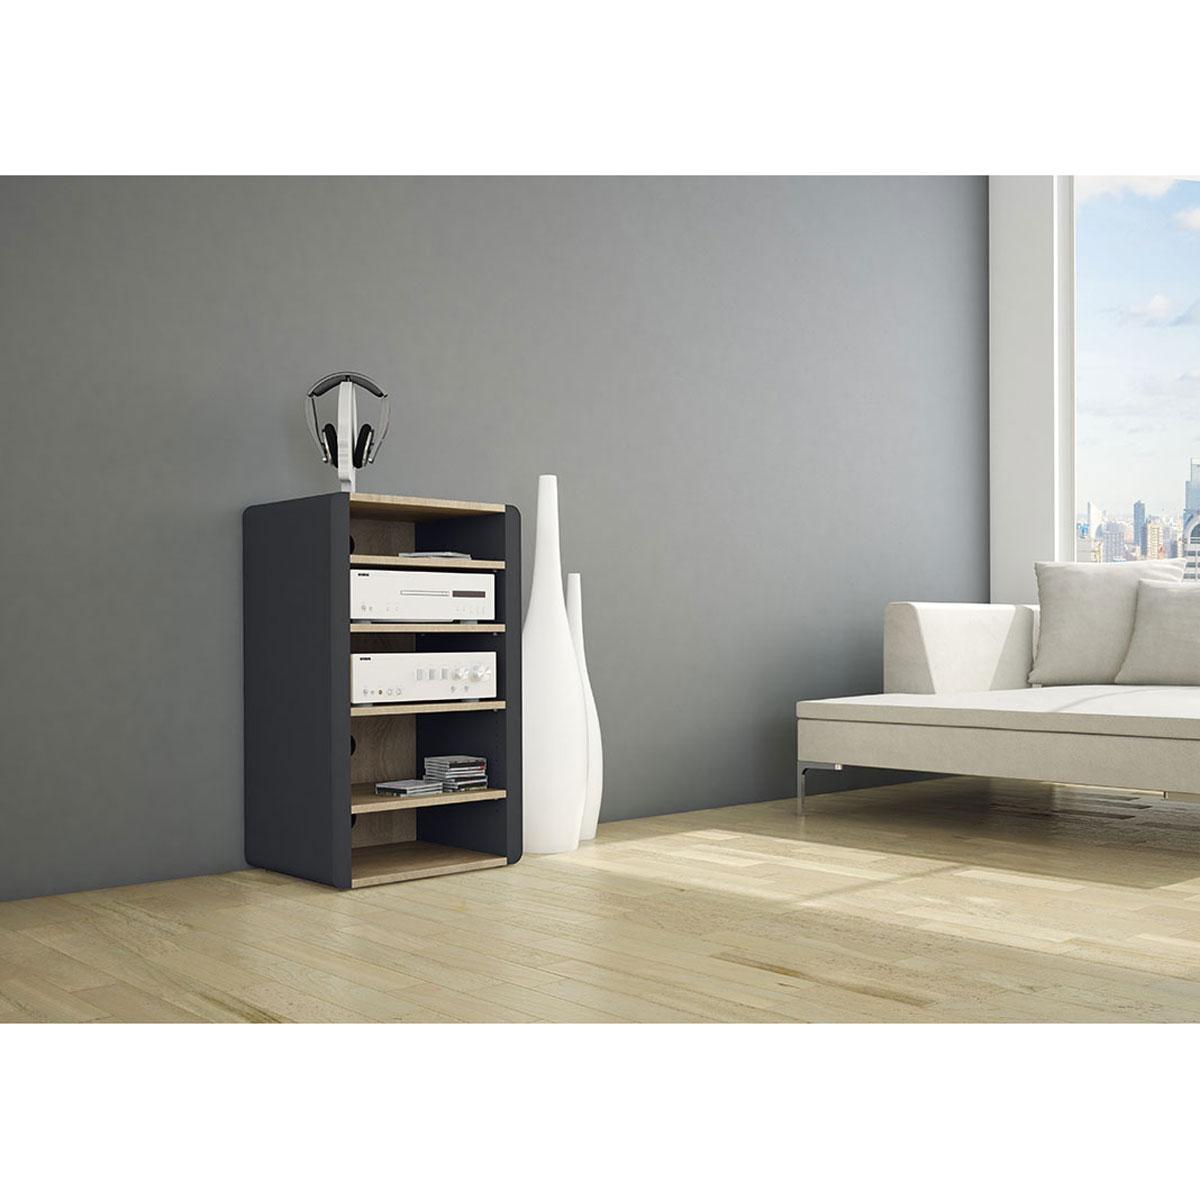 hifi m bel phonom bel hifi racks hifi regale audio. Black Bedroom Furniture Sets. Home Design Ideas